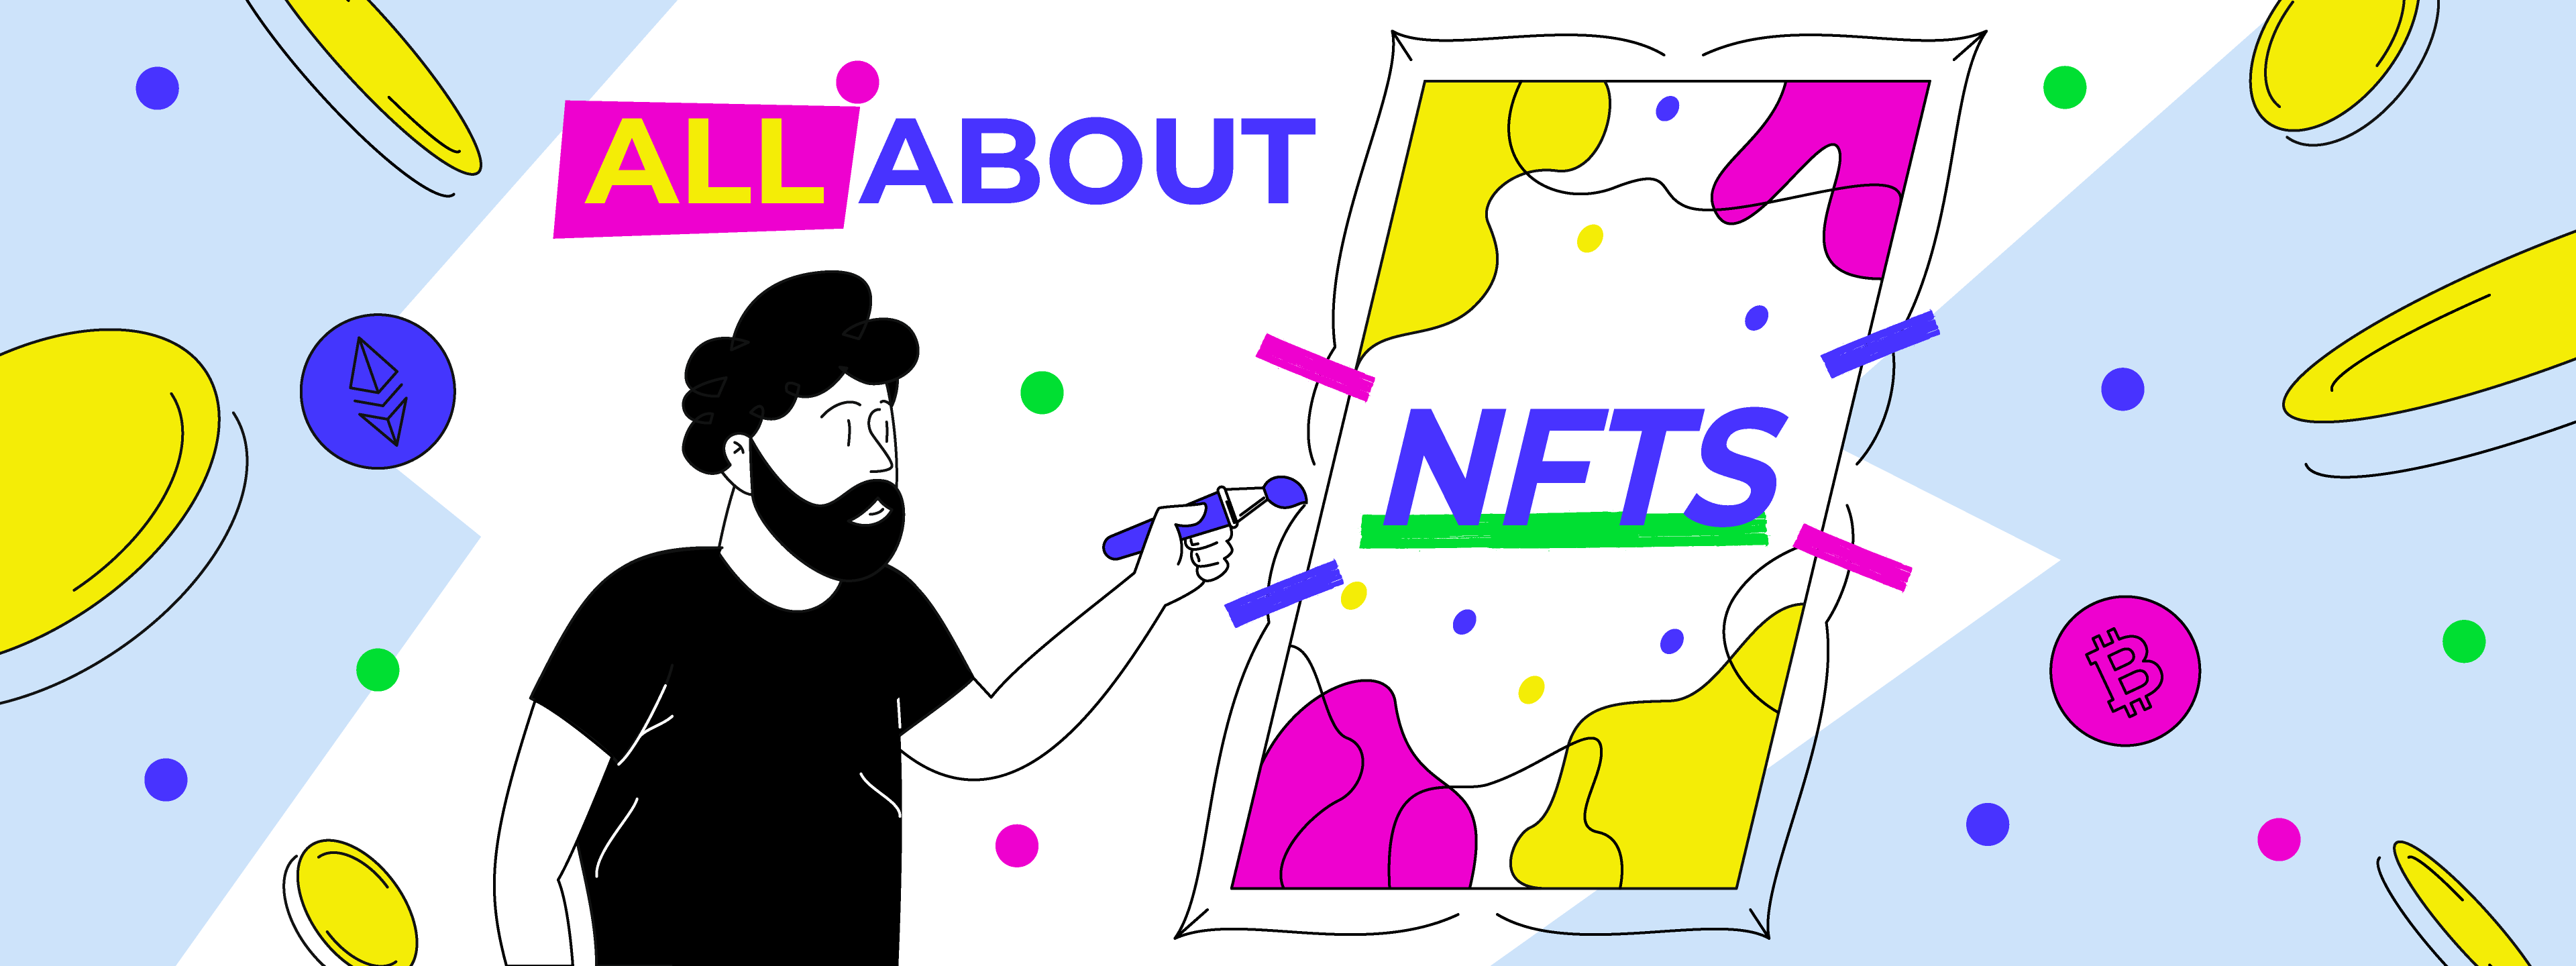 All About NFTs – the next big development for digital art